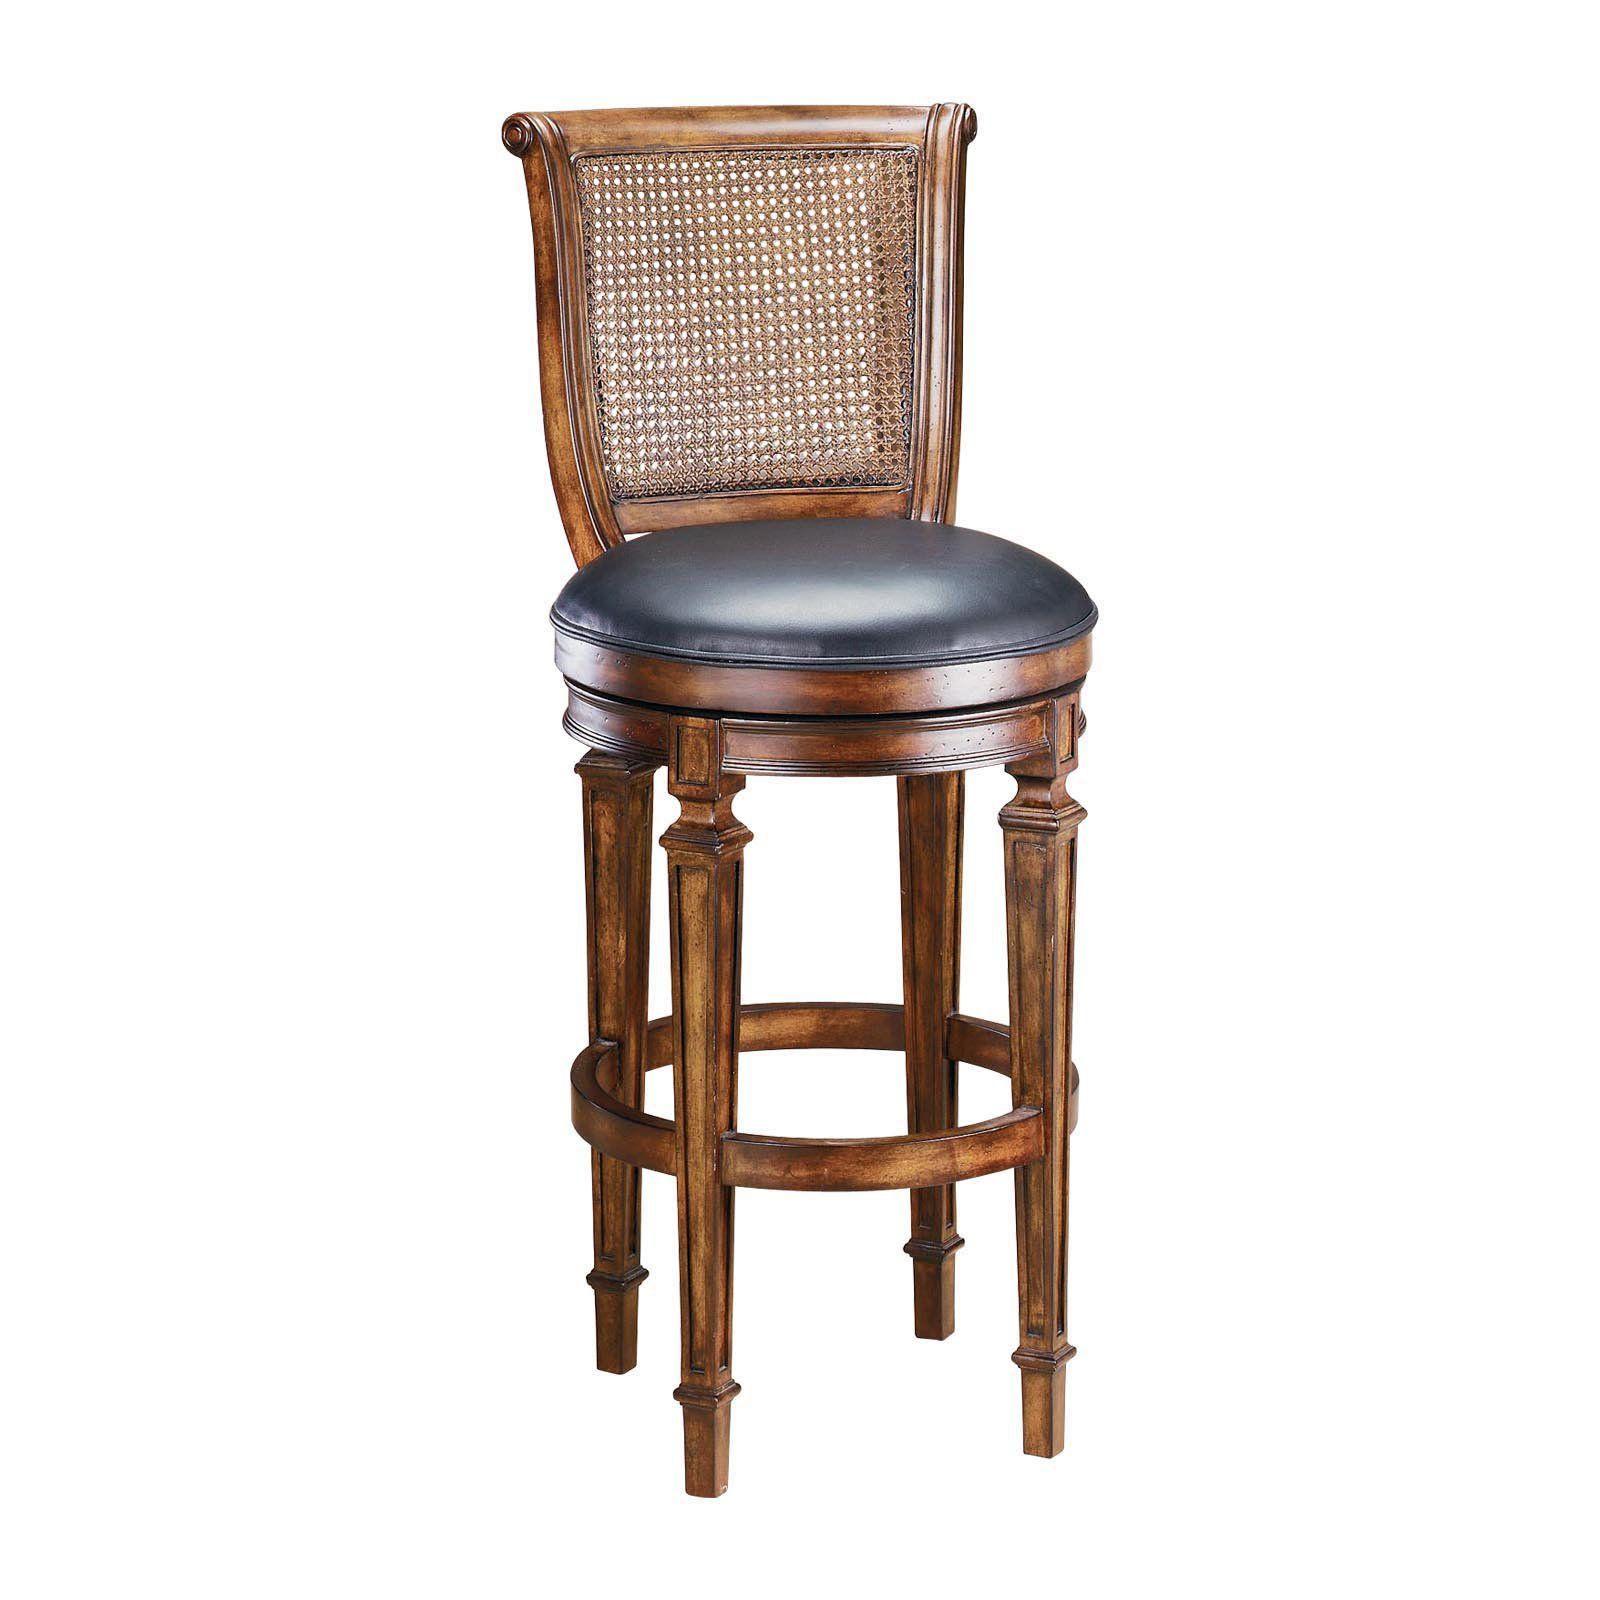 Hillsdale Dalton 30 In Cane Back Swivel Bar Stool Www Hayneedle Com Bar Stools Hillsdale Furniture Bar Stools With Backs